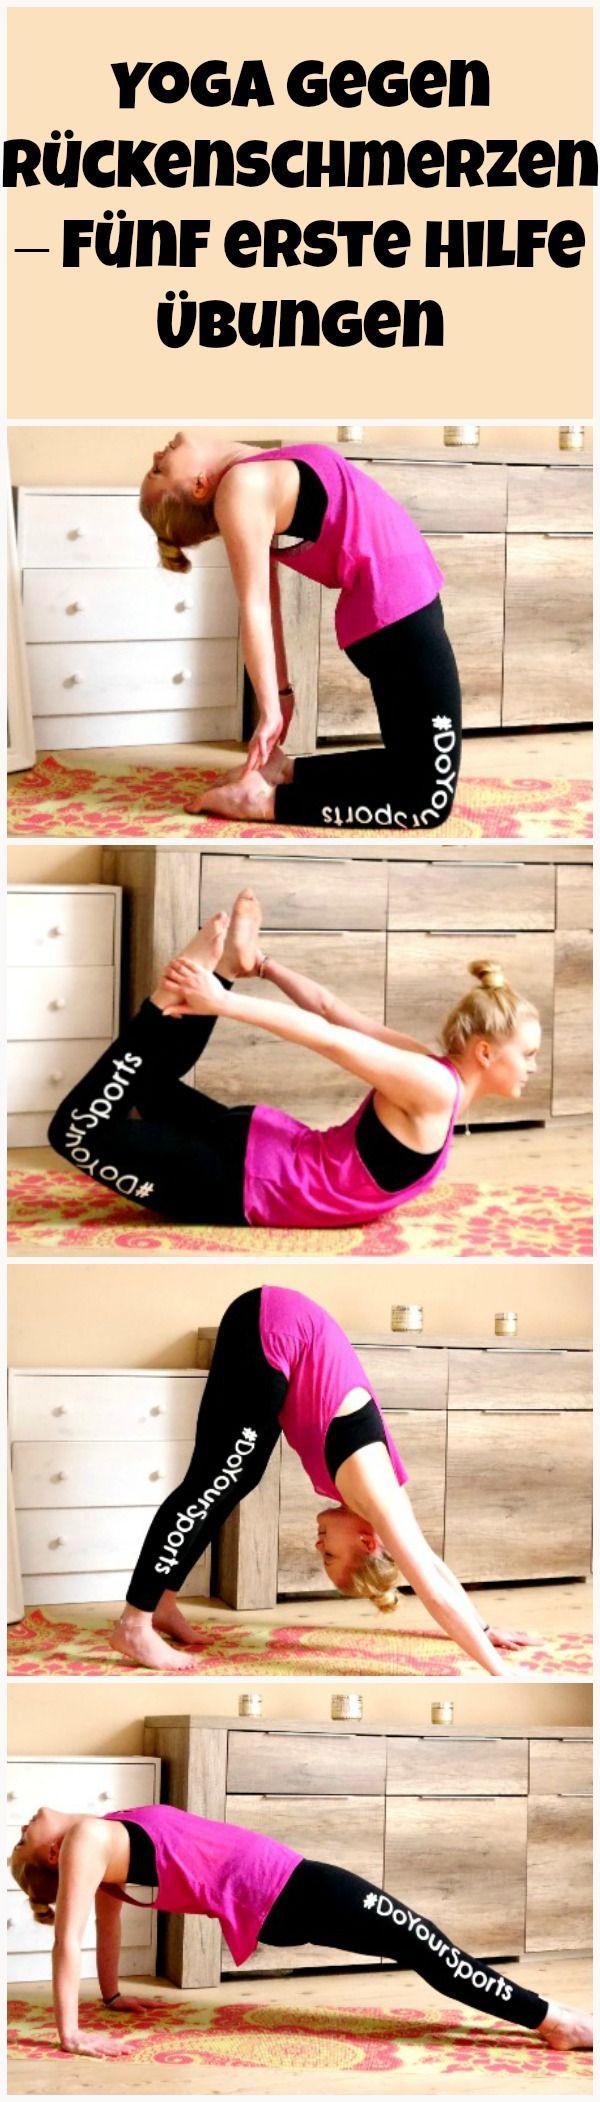 Yoga gegen Rückenschmerzen Teil 1 - Fünf erste Hilfe Übungen #pilatesposes